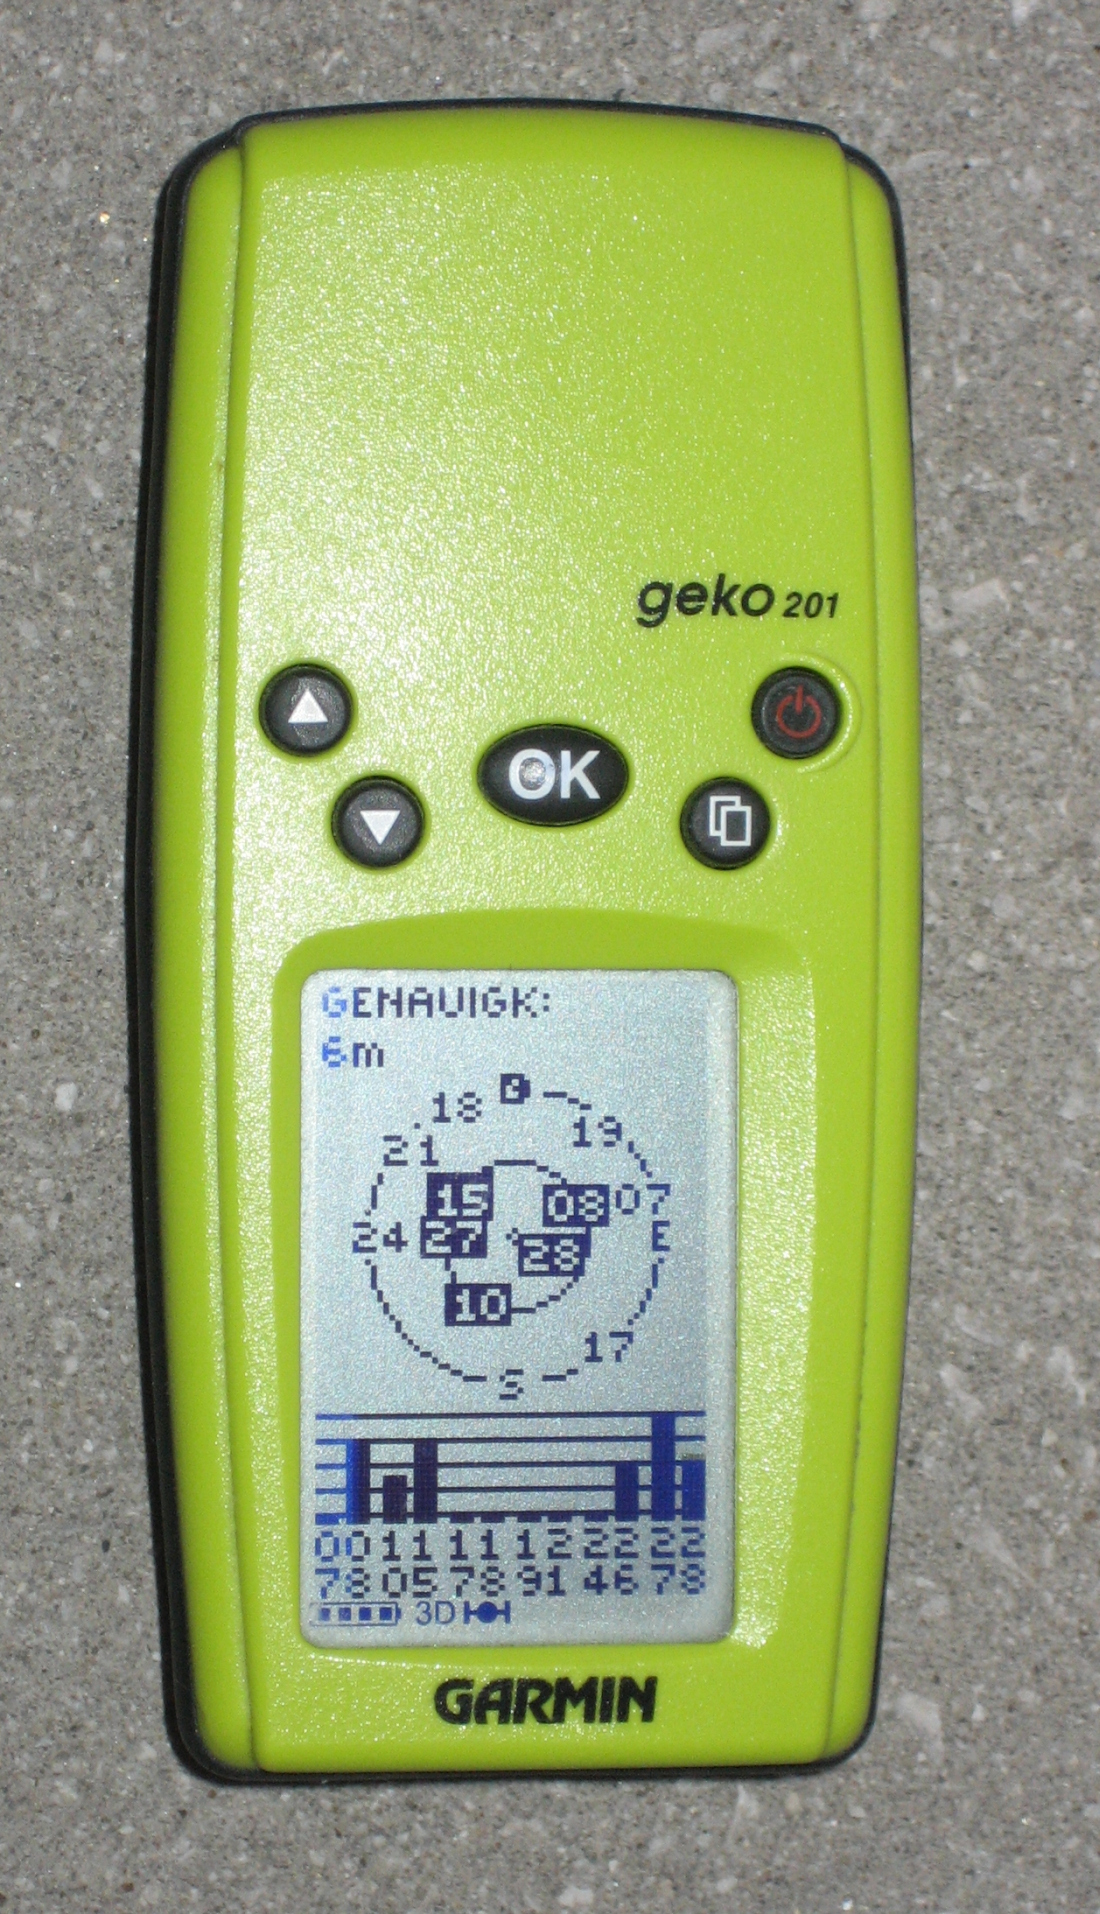 Garmin Geko 201  Garmin-geko-201-01